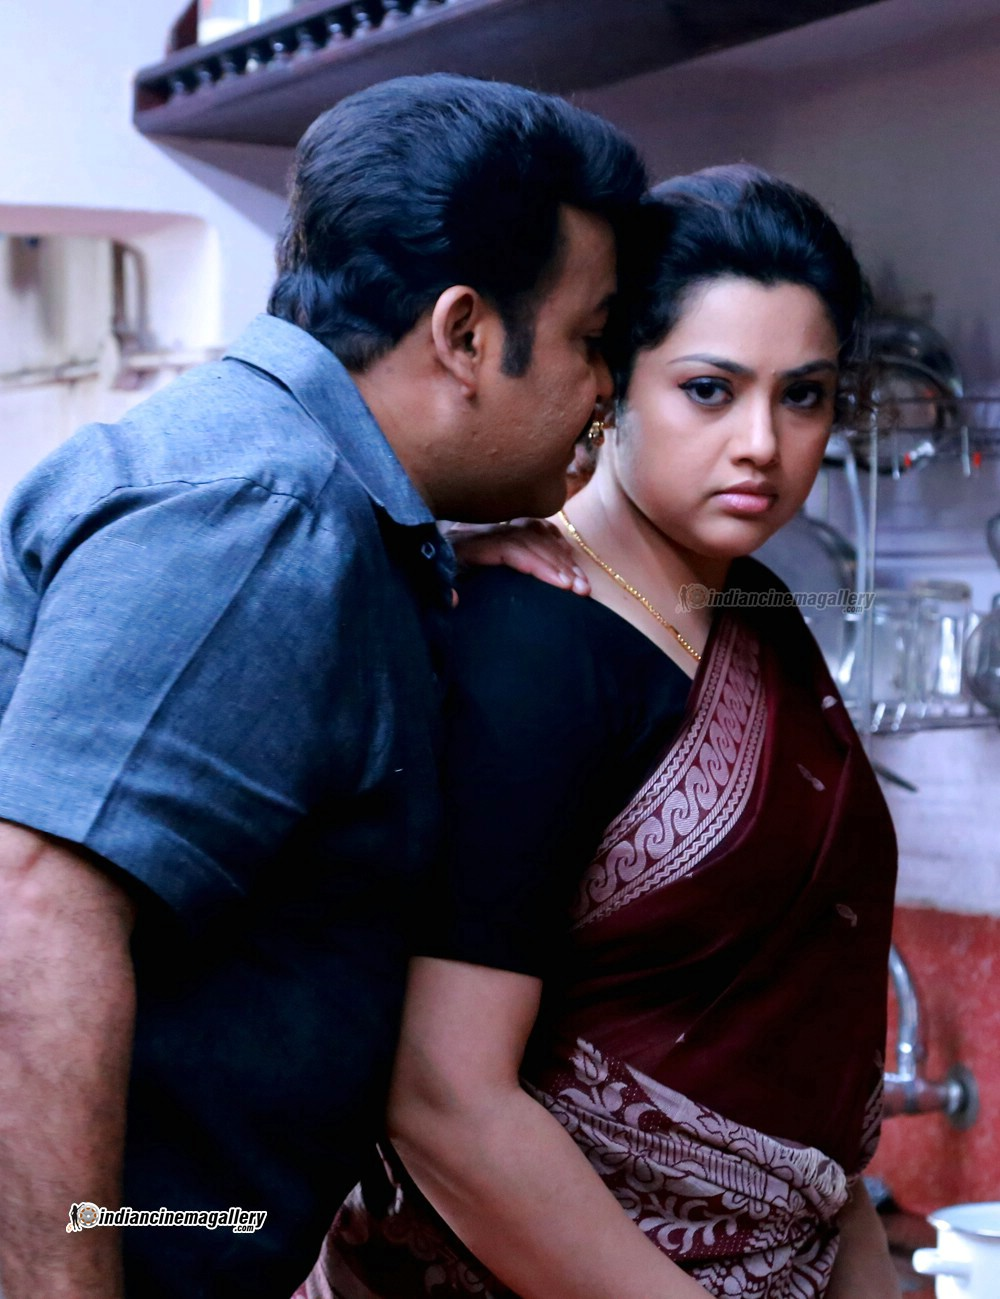 ... .com: Meena latest hot photos in saree from Drishyam Malayaalm movie